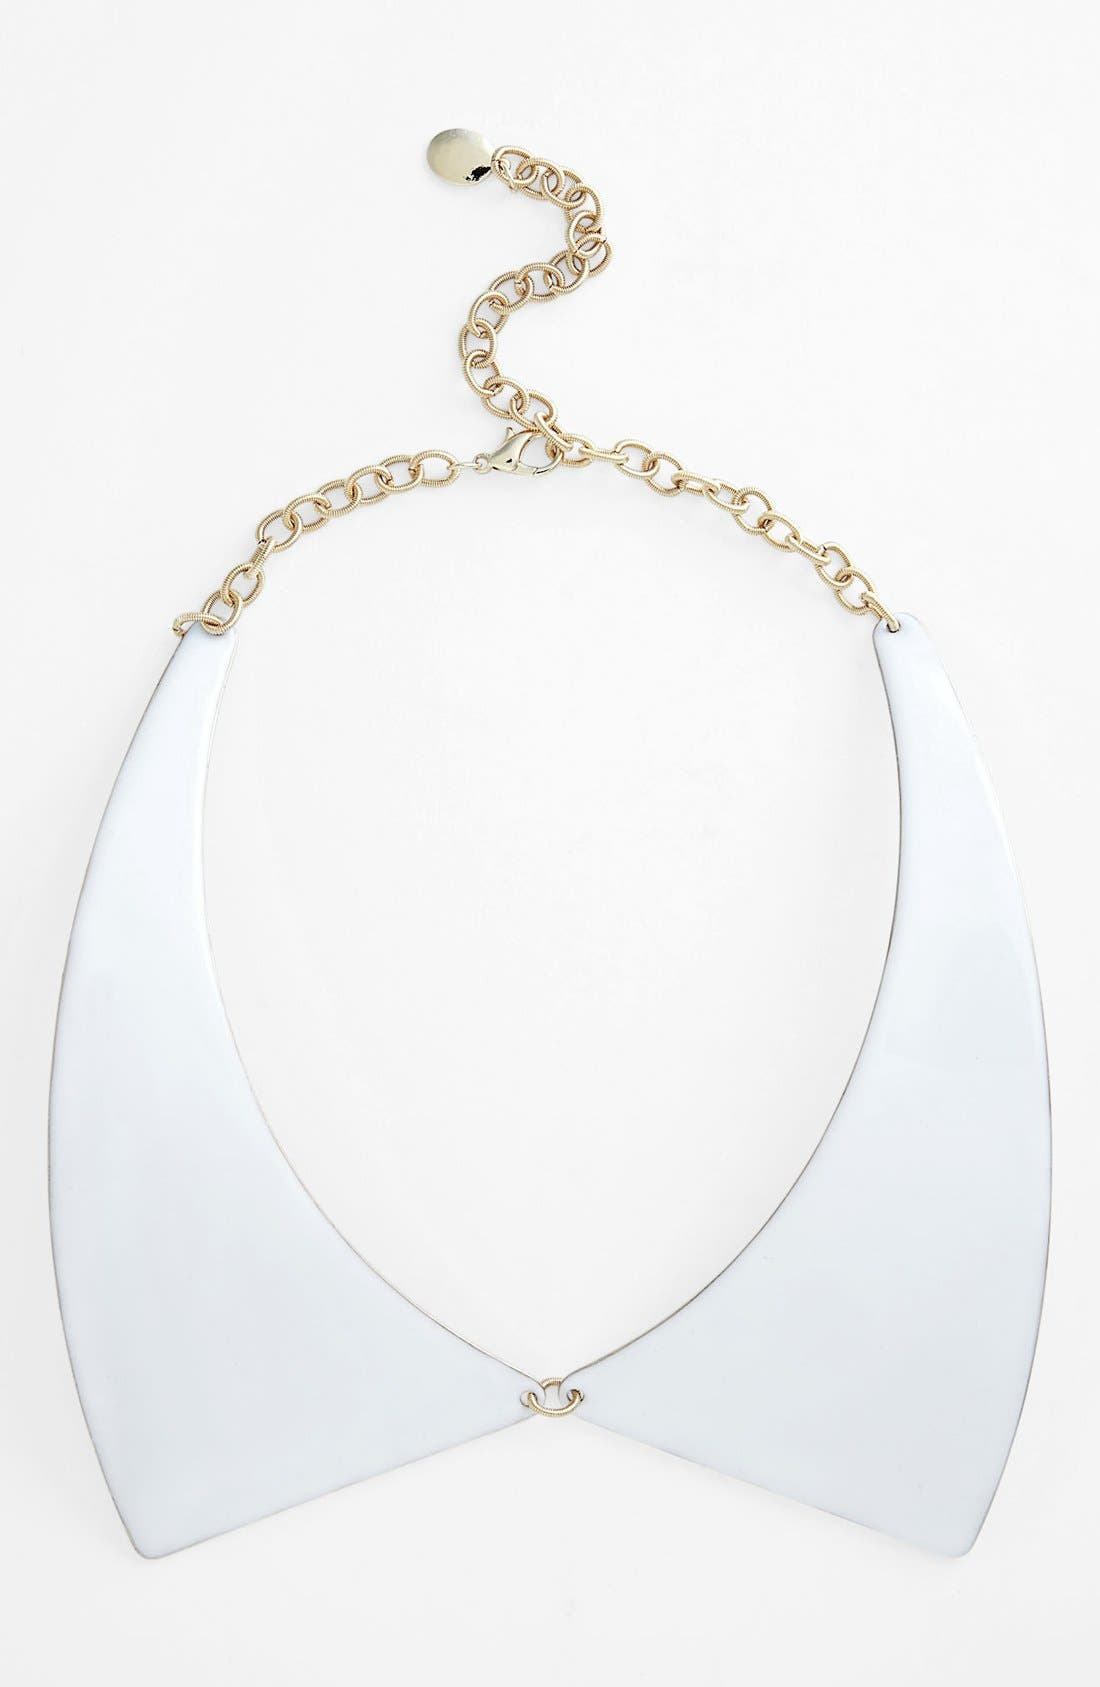 Alternate Image 1 Selected - Bonnie Jonas Metal Collar Necklace